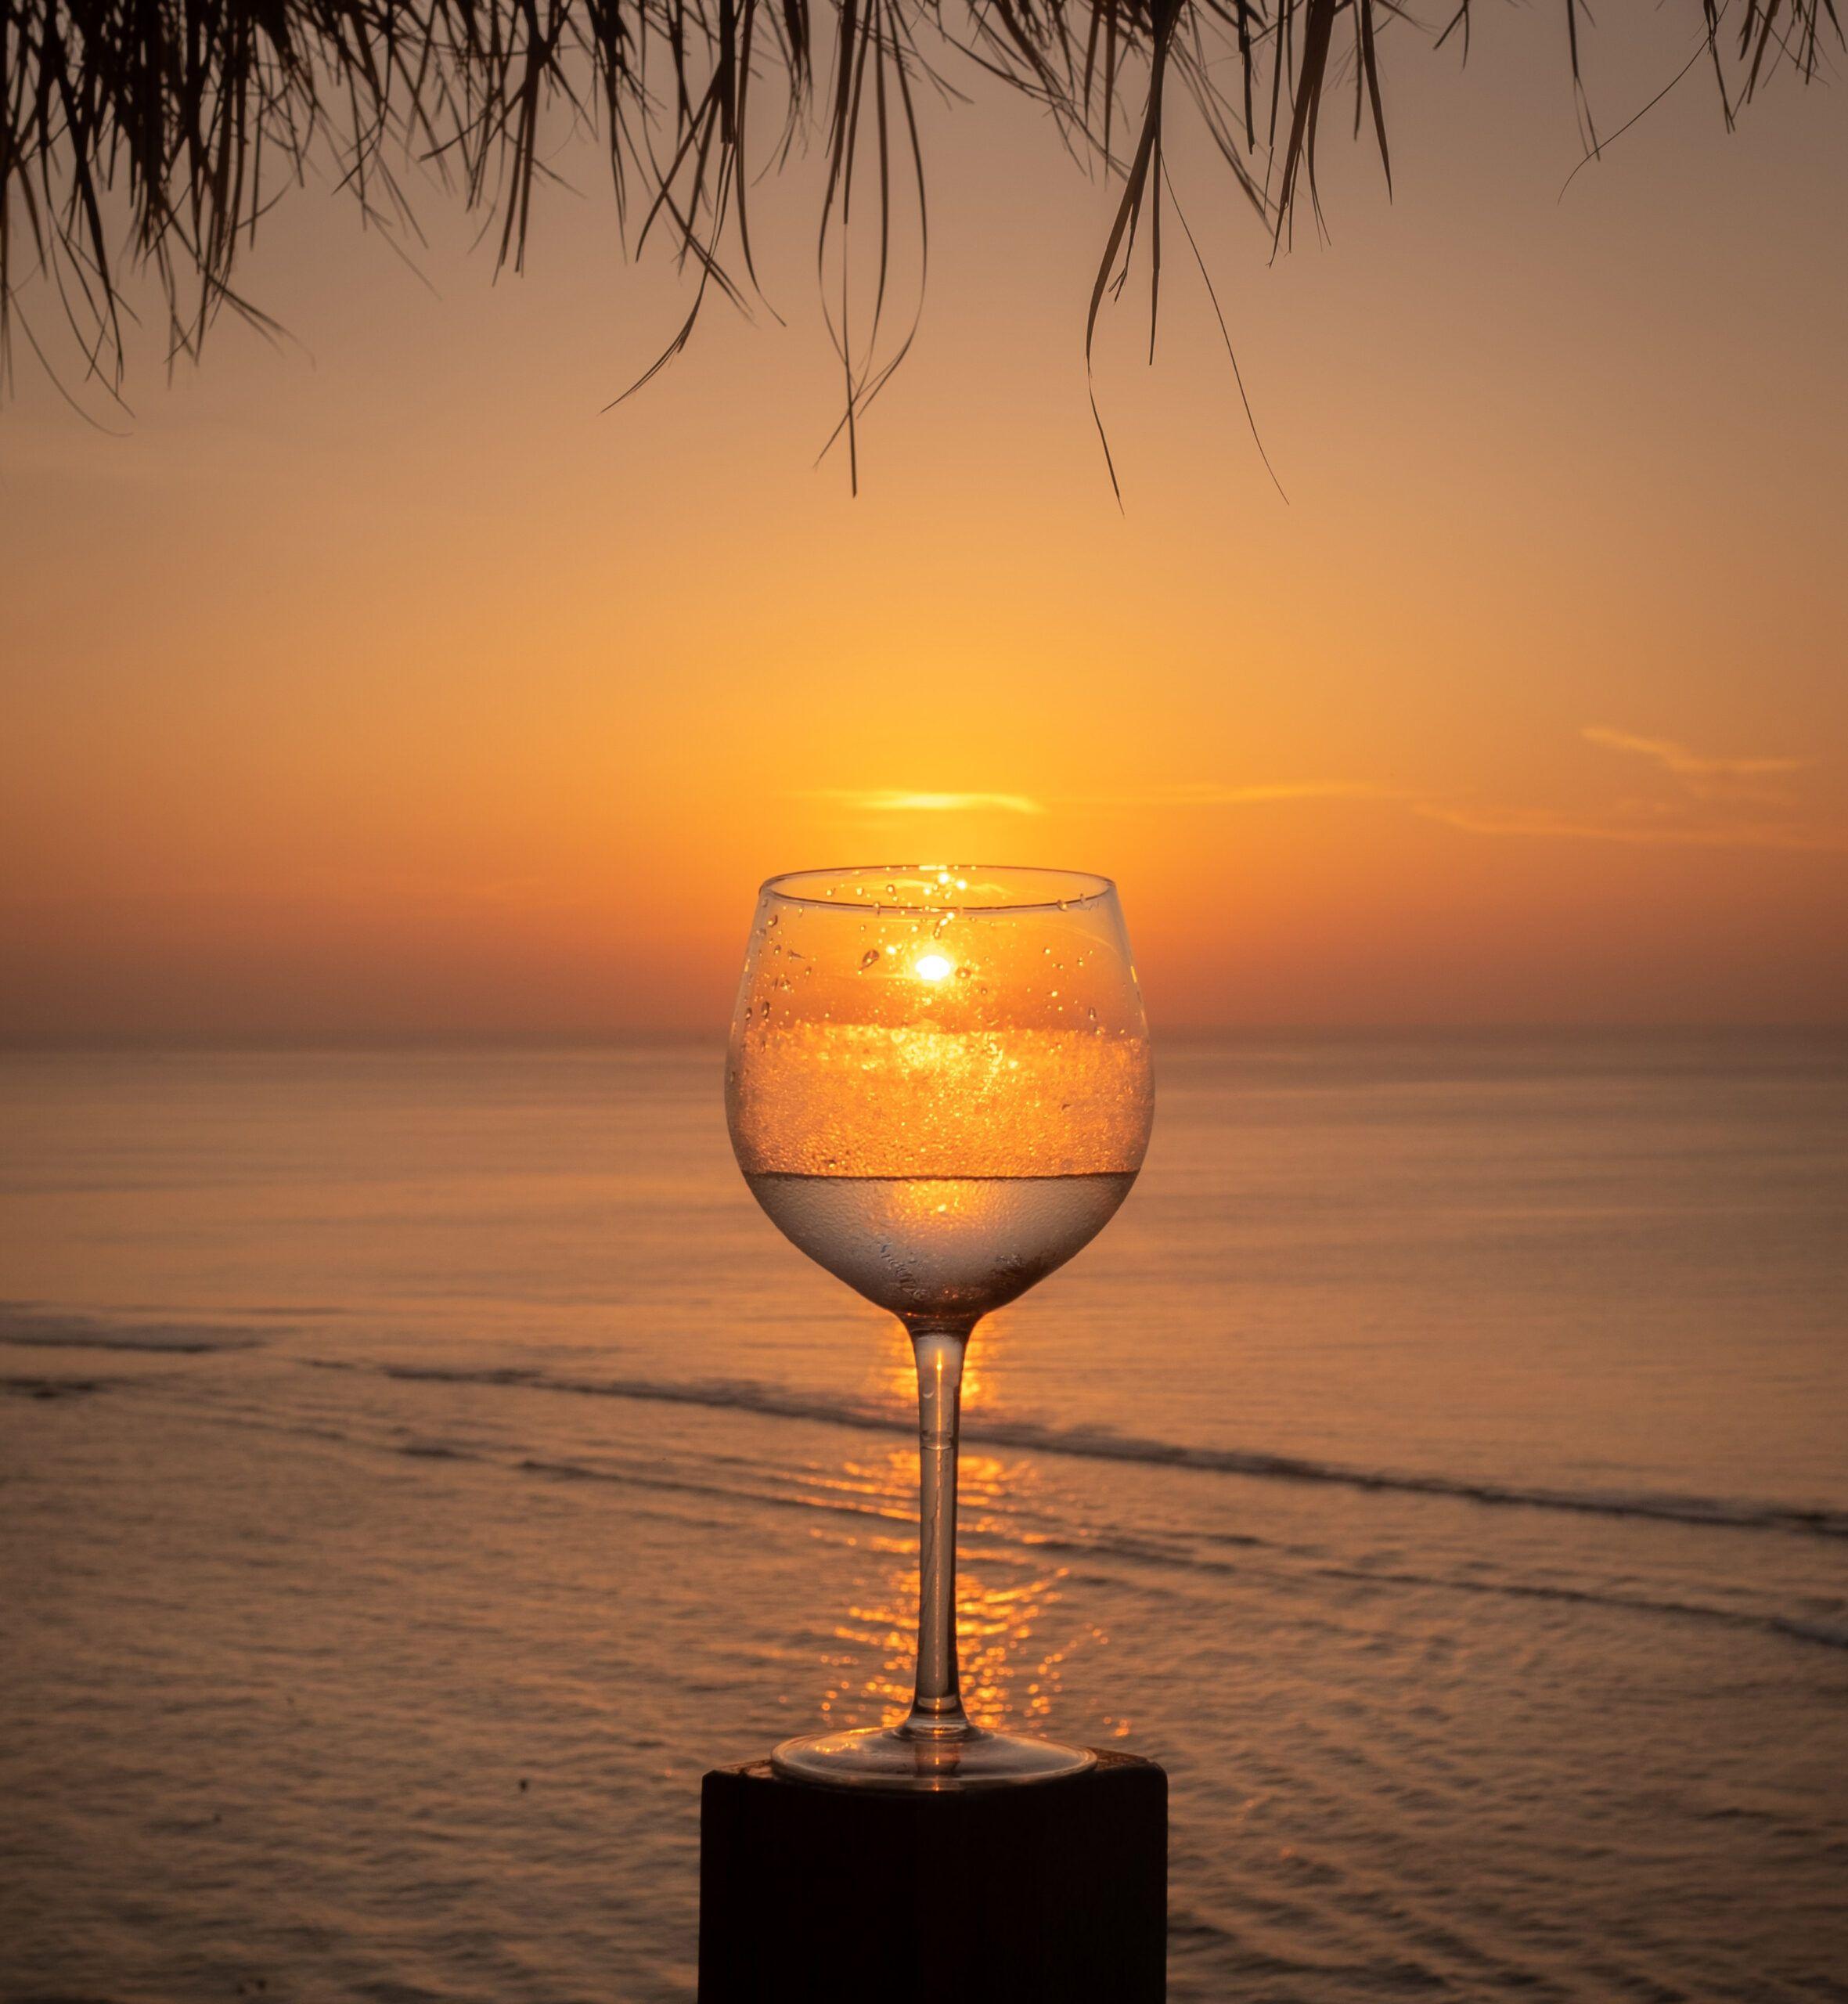 vino blanco para tomar en la playa